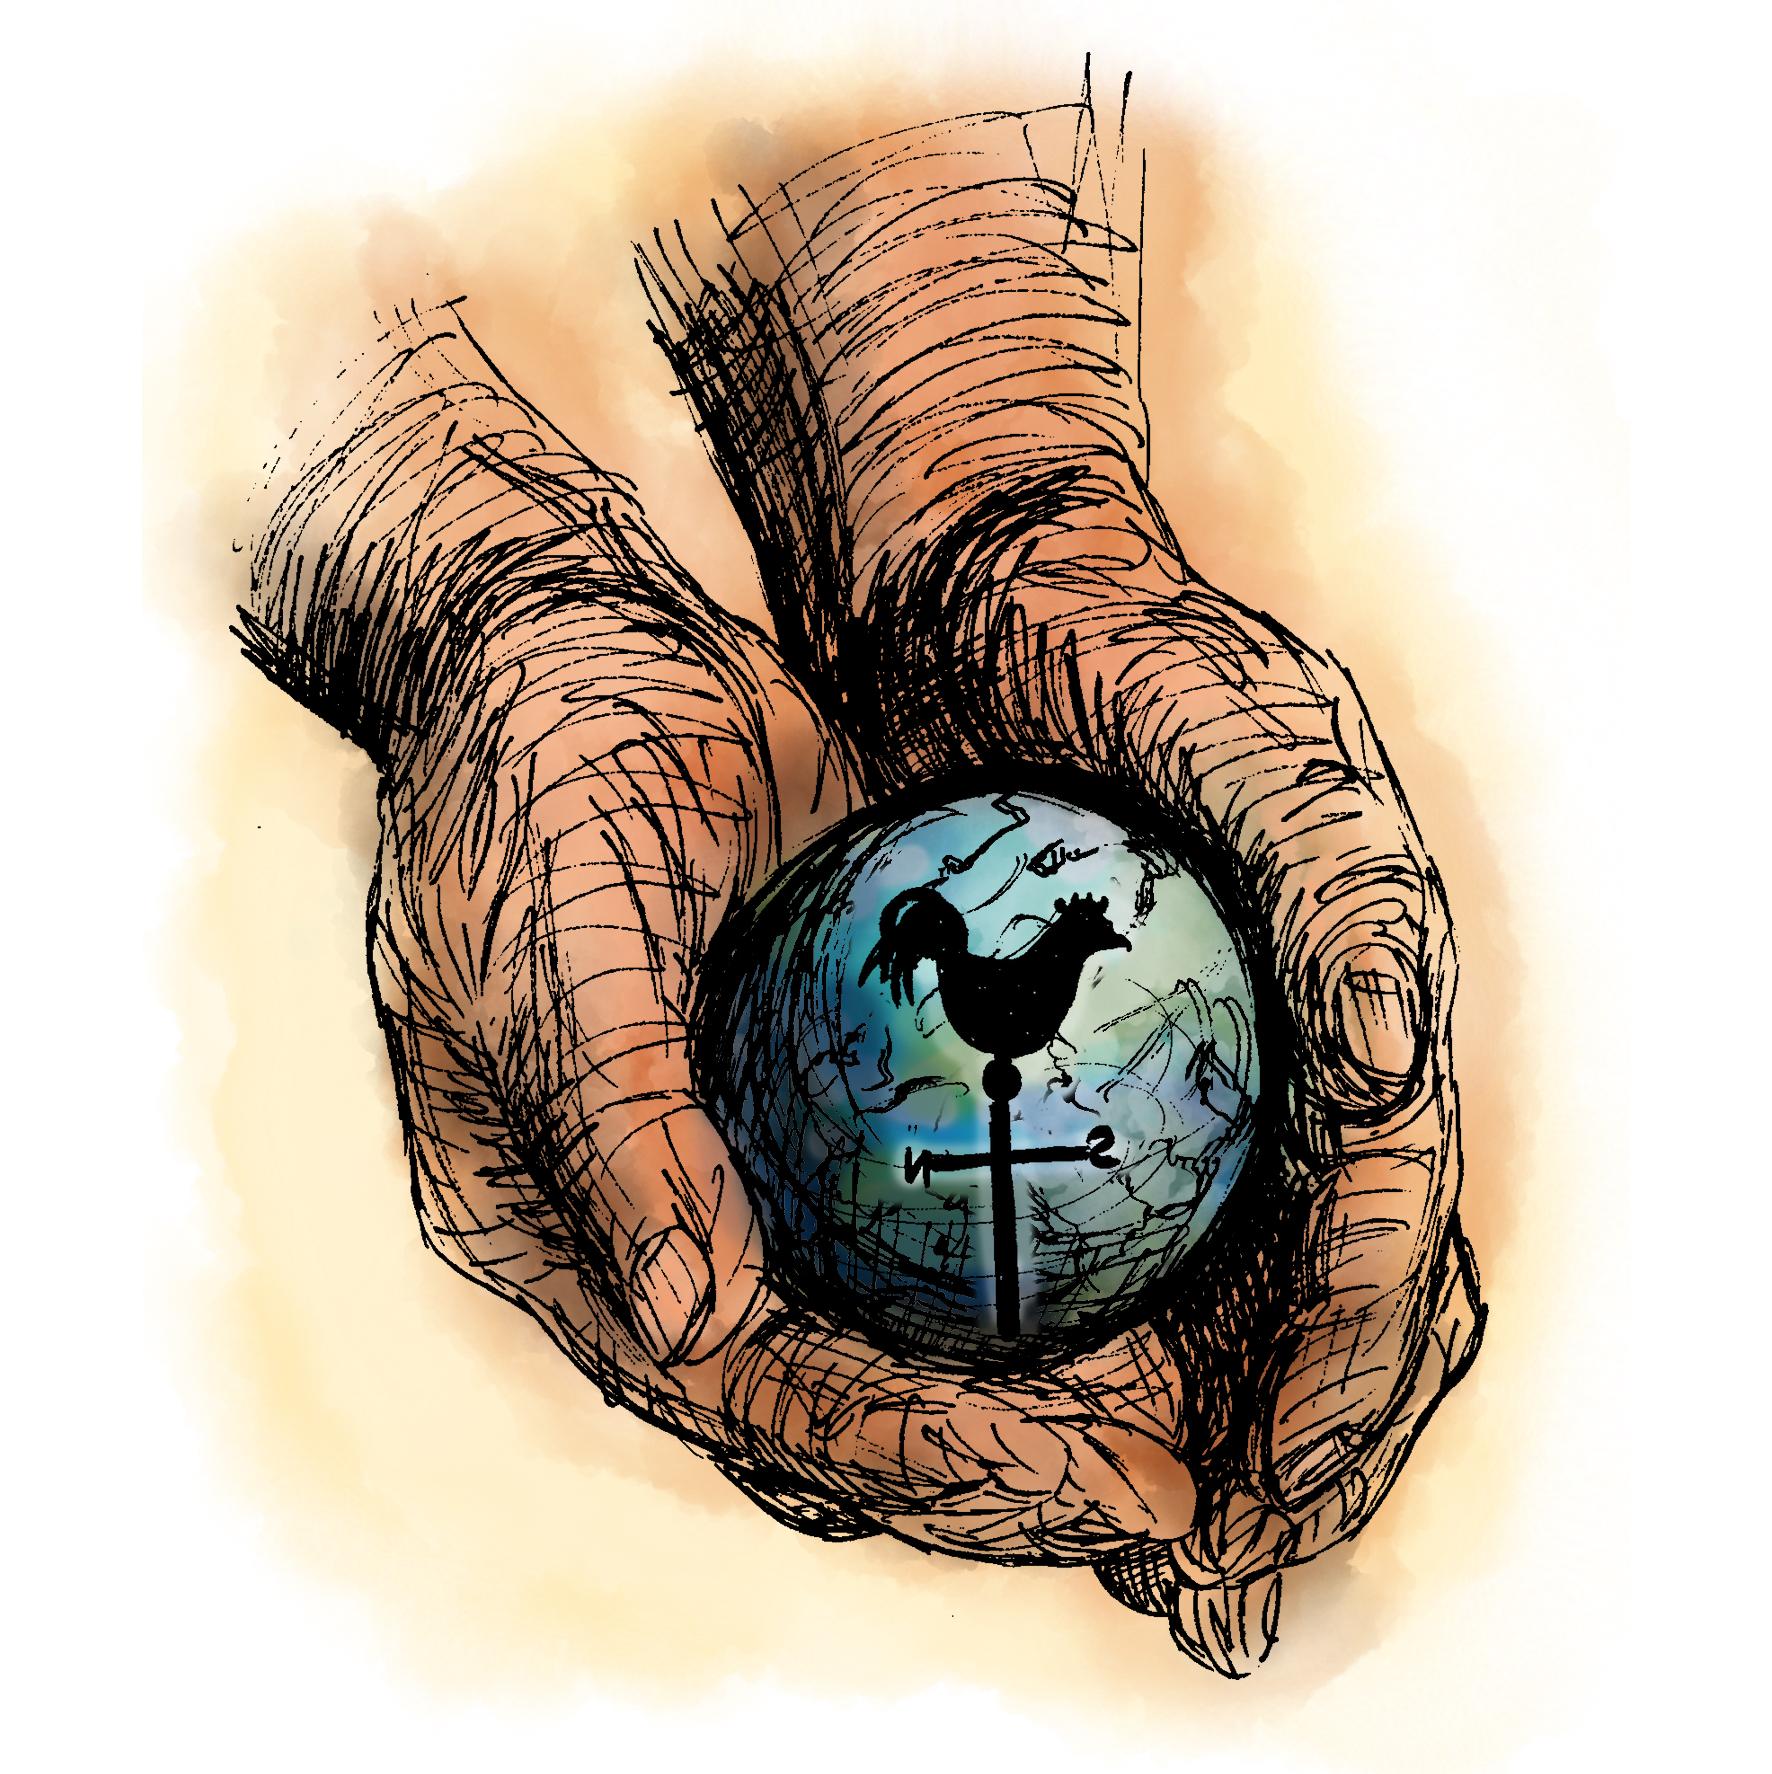 Gott hat die Welt in der Hand. Illustratorin Vida Sprenger vidART.ch